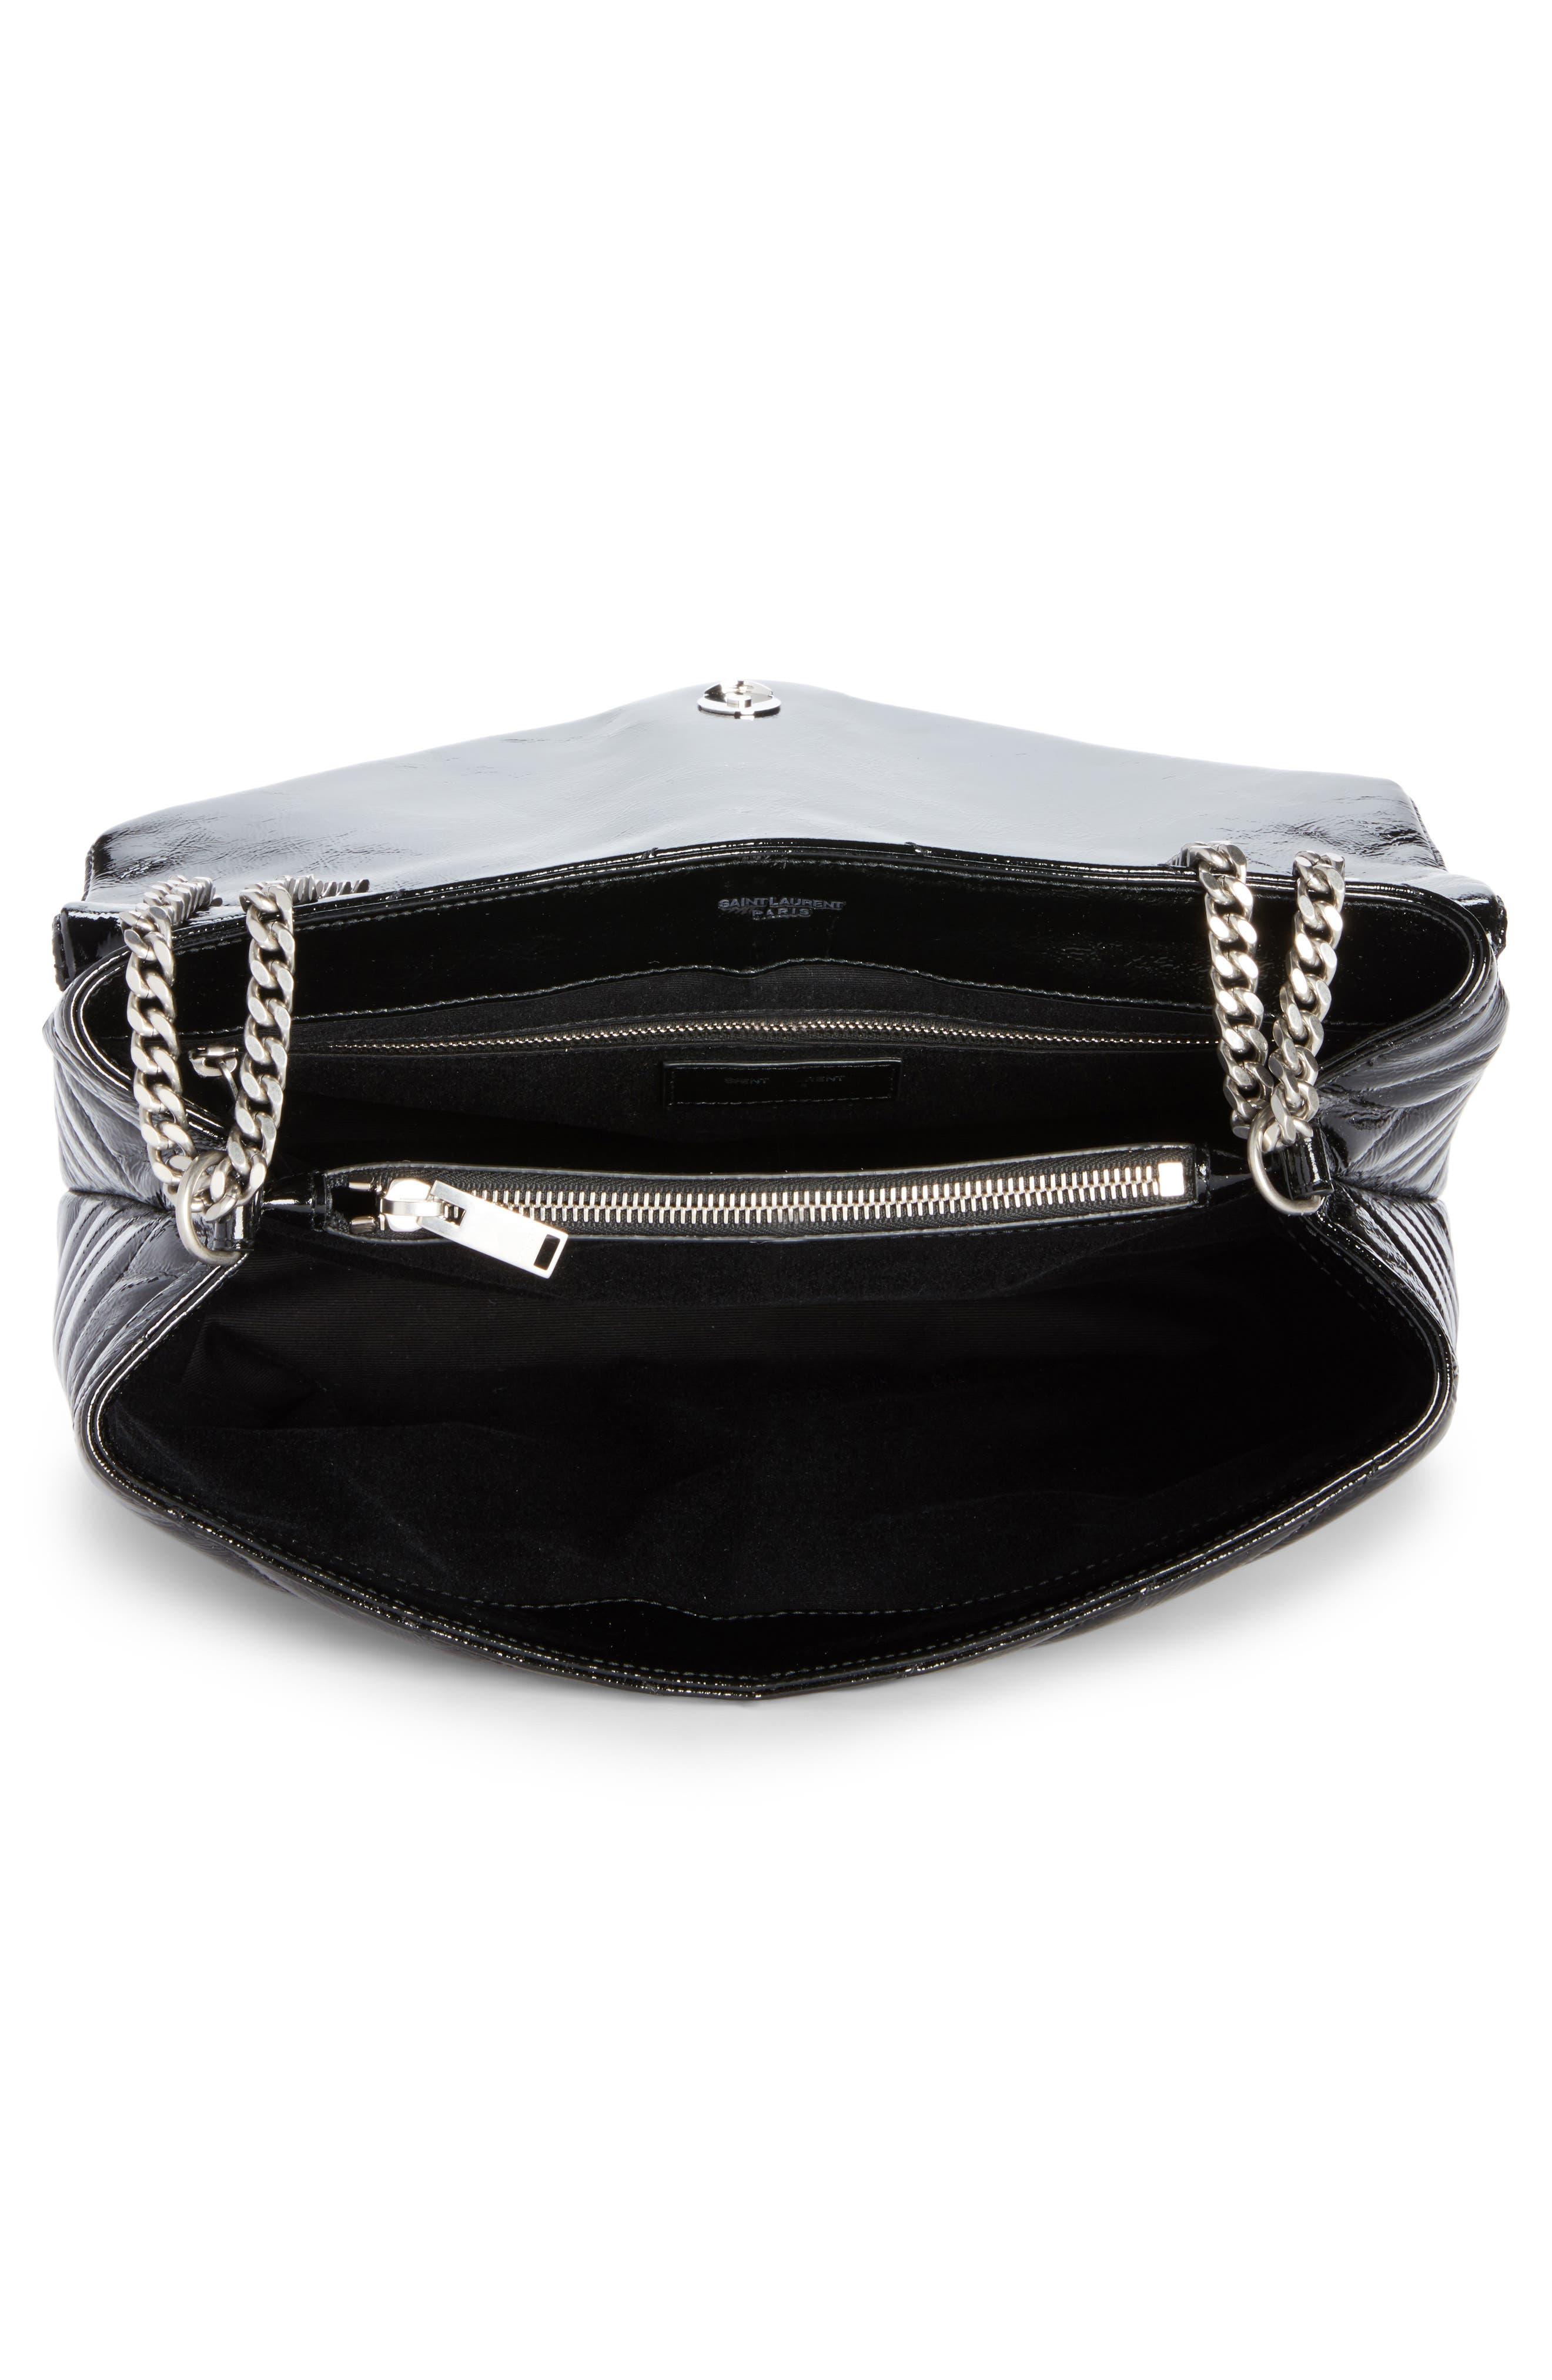 Medium Loulou Patent Leather Shoulder Bag,                             Alternate thumbnail 4, color,                             001